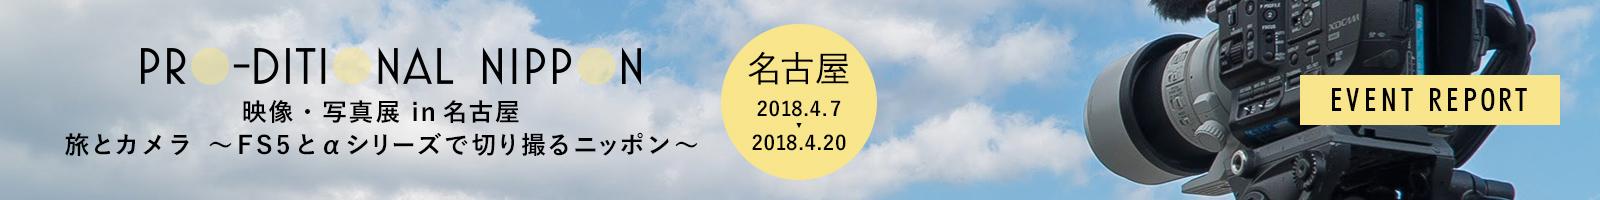 PRO-DITIONAL NIPPON 映像・写真展「旅とカメラ」~FS5とαシリーズで切り撮るニッポン~